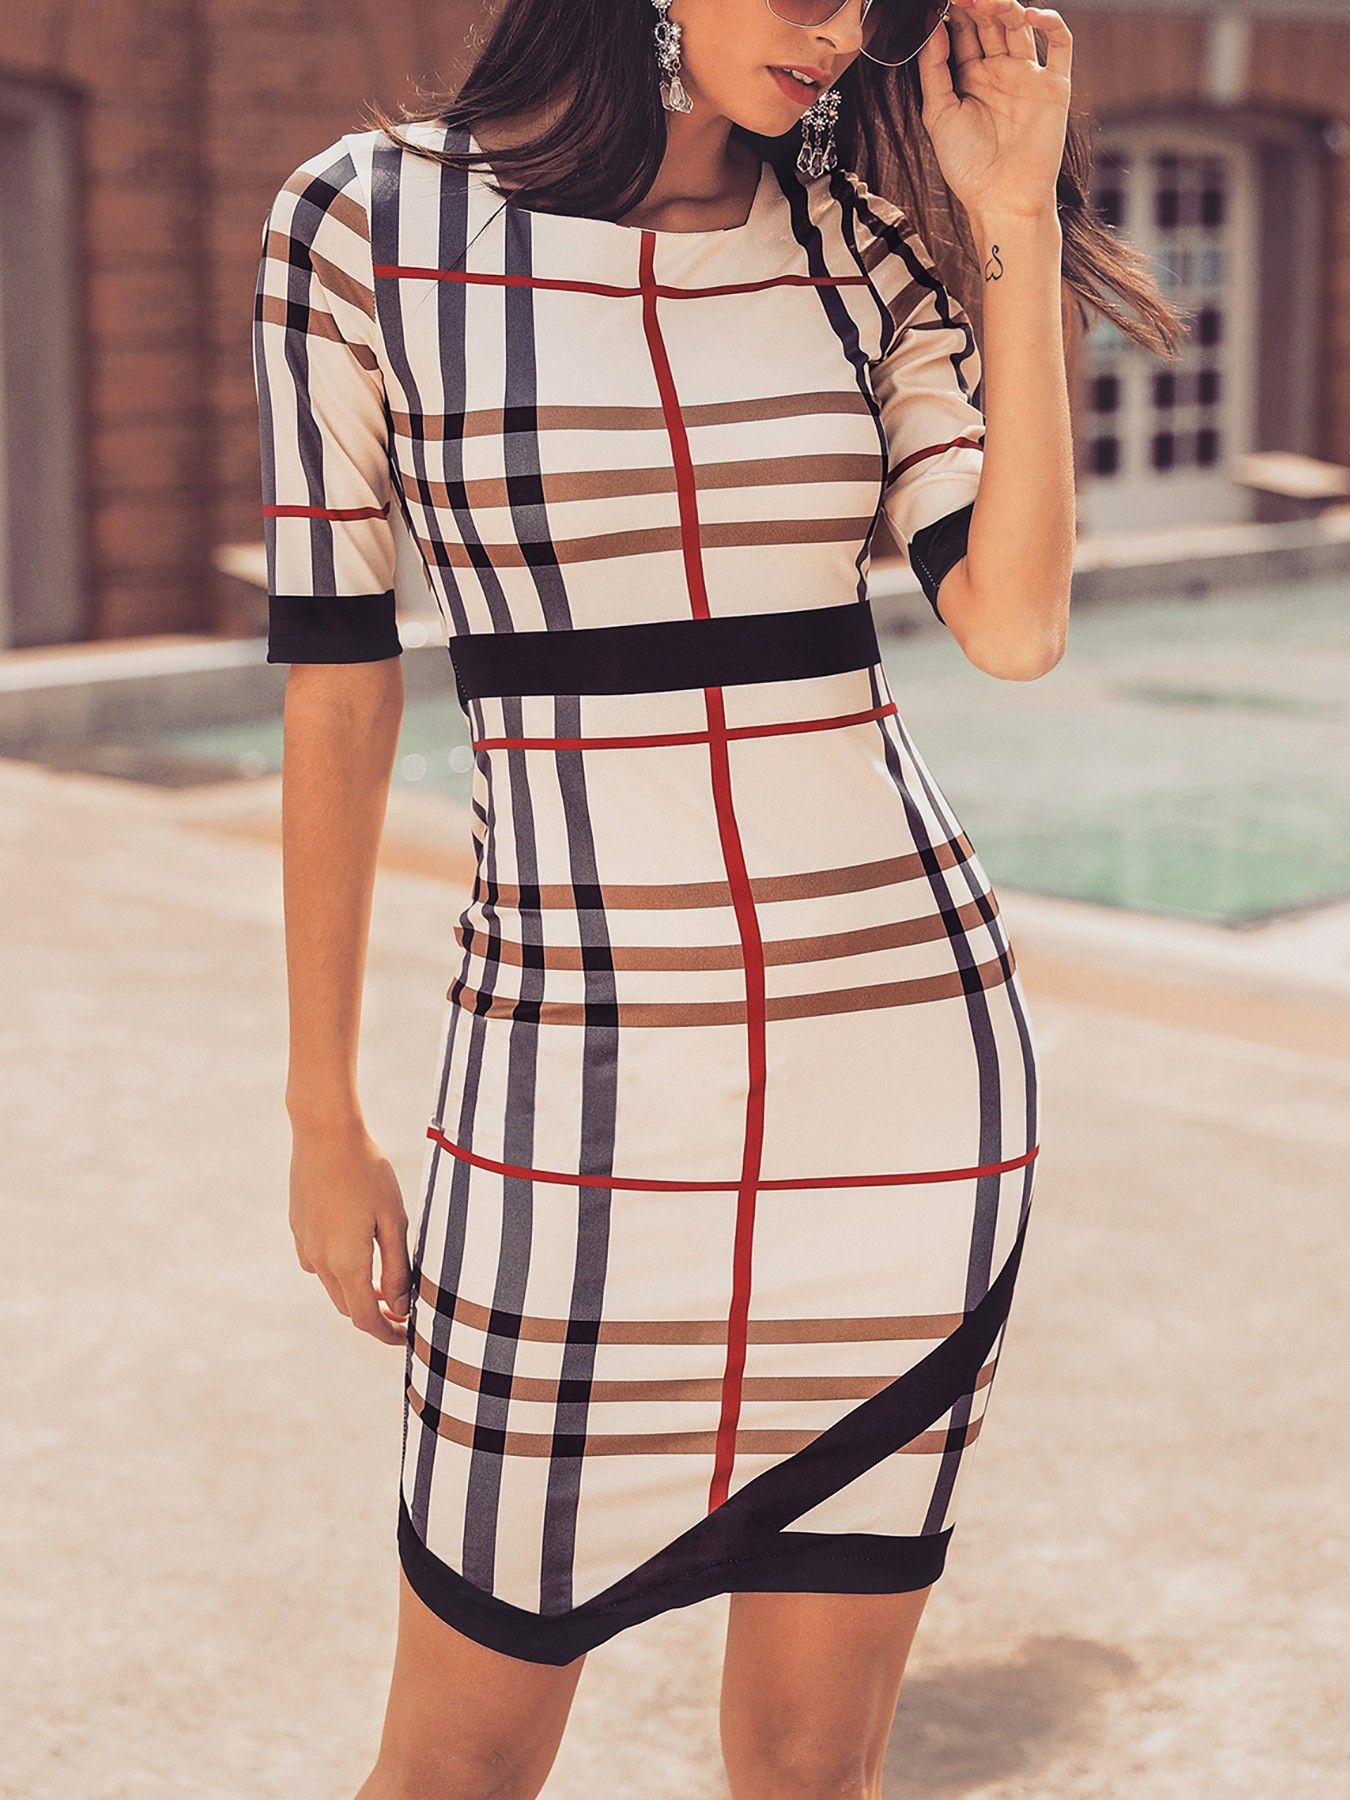 boutiquefeel / Plaid Print Contrast Binding Irregular Hem Dress